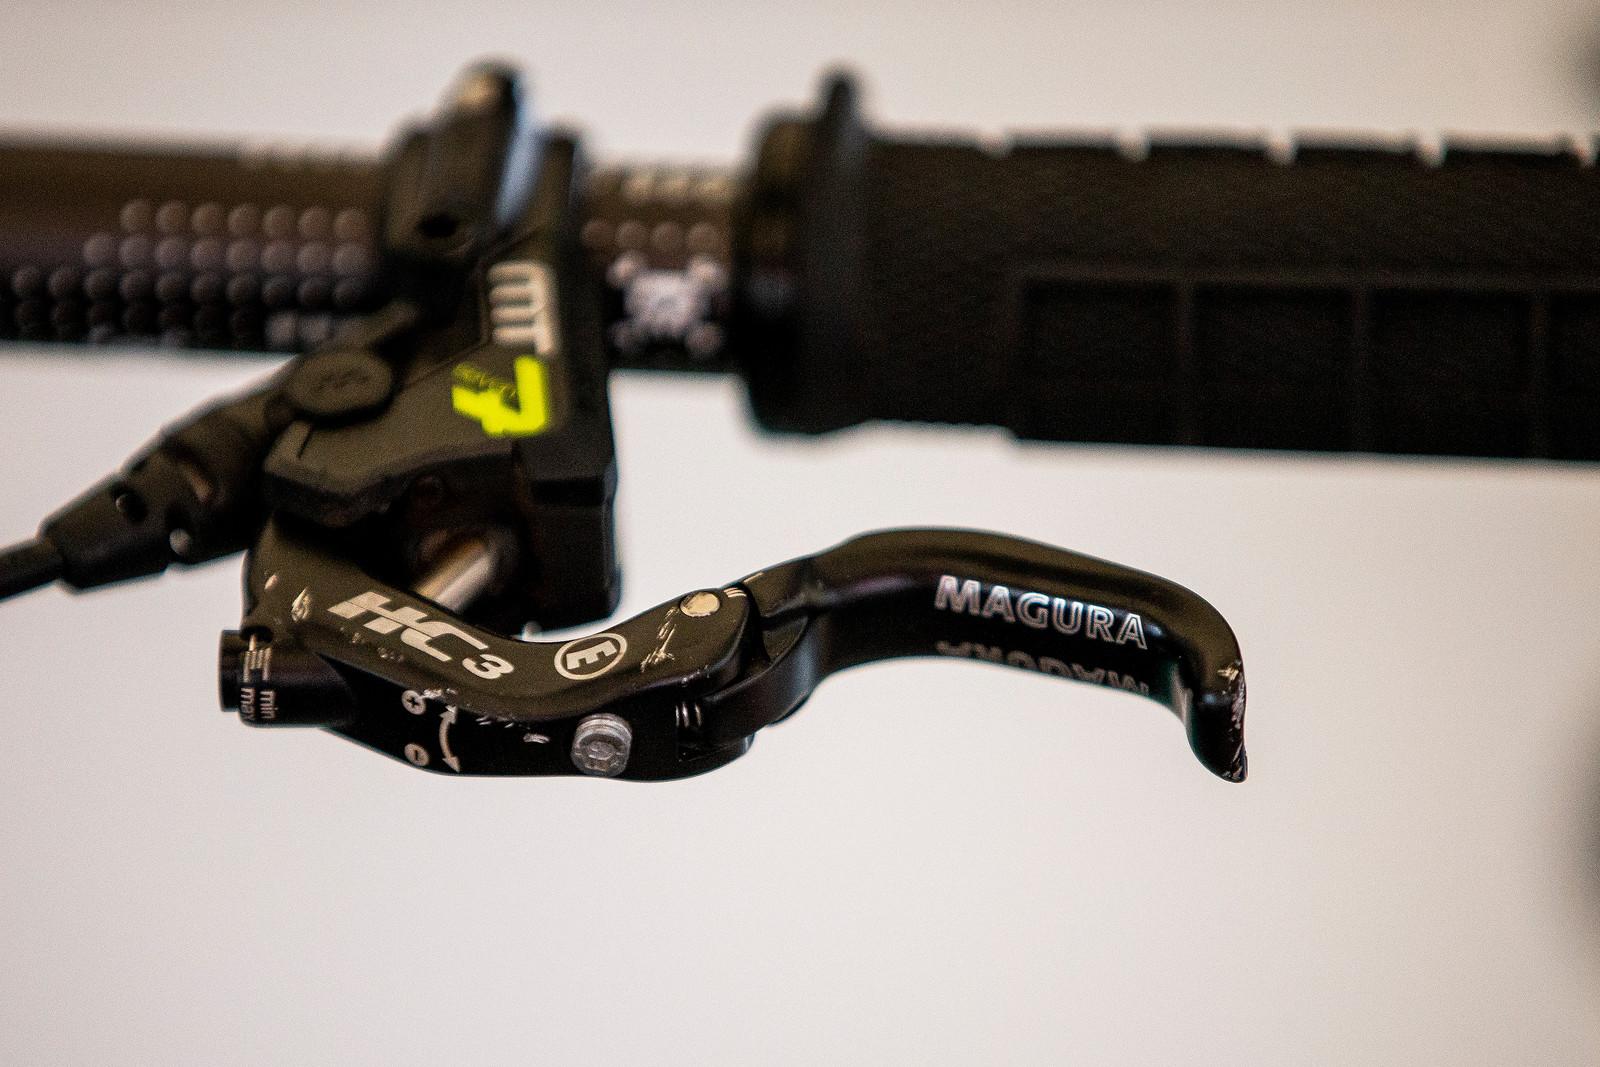 Magura Brake Lever - Mont-Sainte-Anne 2018 PIT BITS - Mountain Biking Pictures - Vital MTB